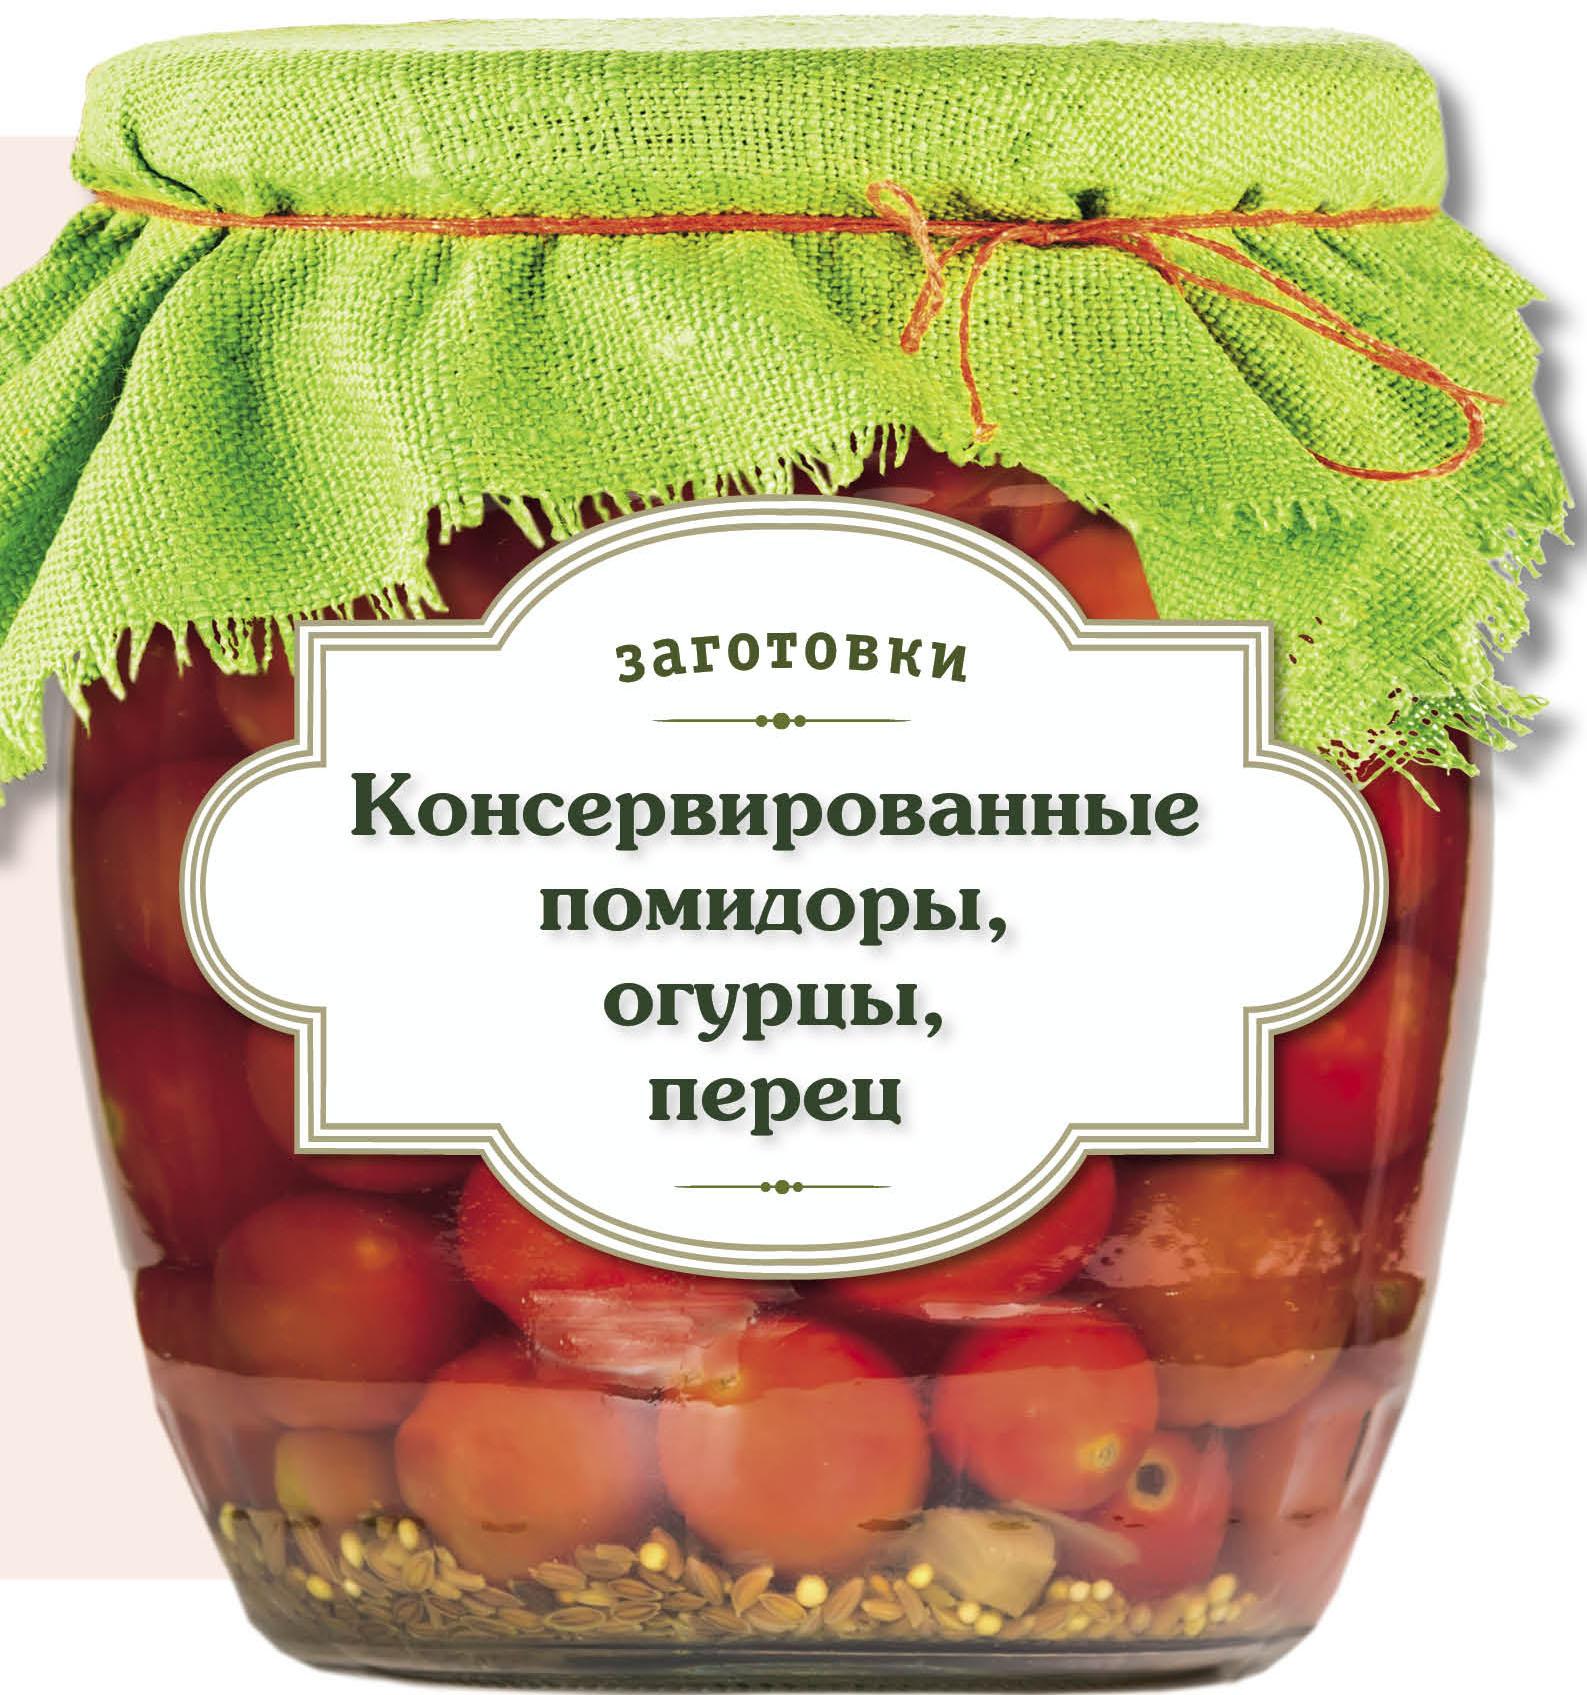 Помидоры перец огурцы консервируем салаты